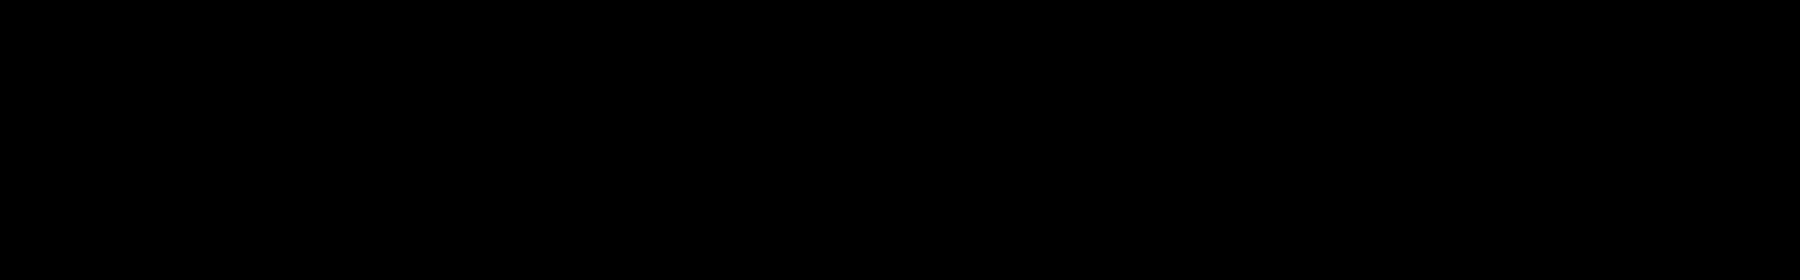 Desza audio waveform